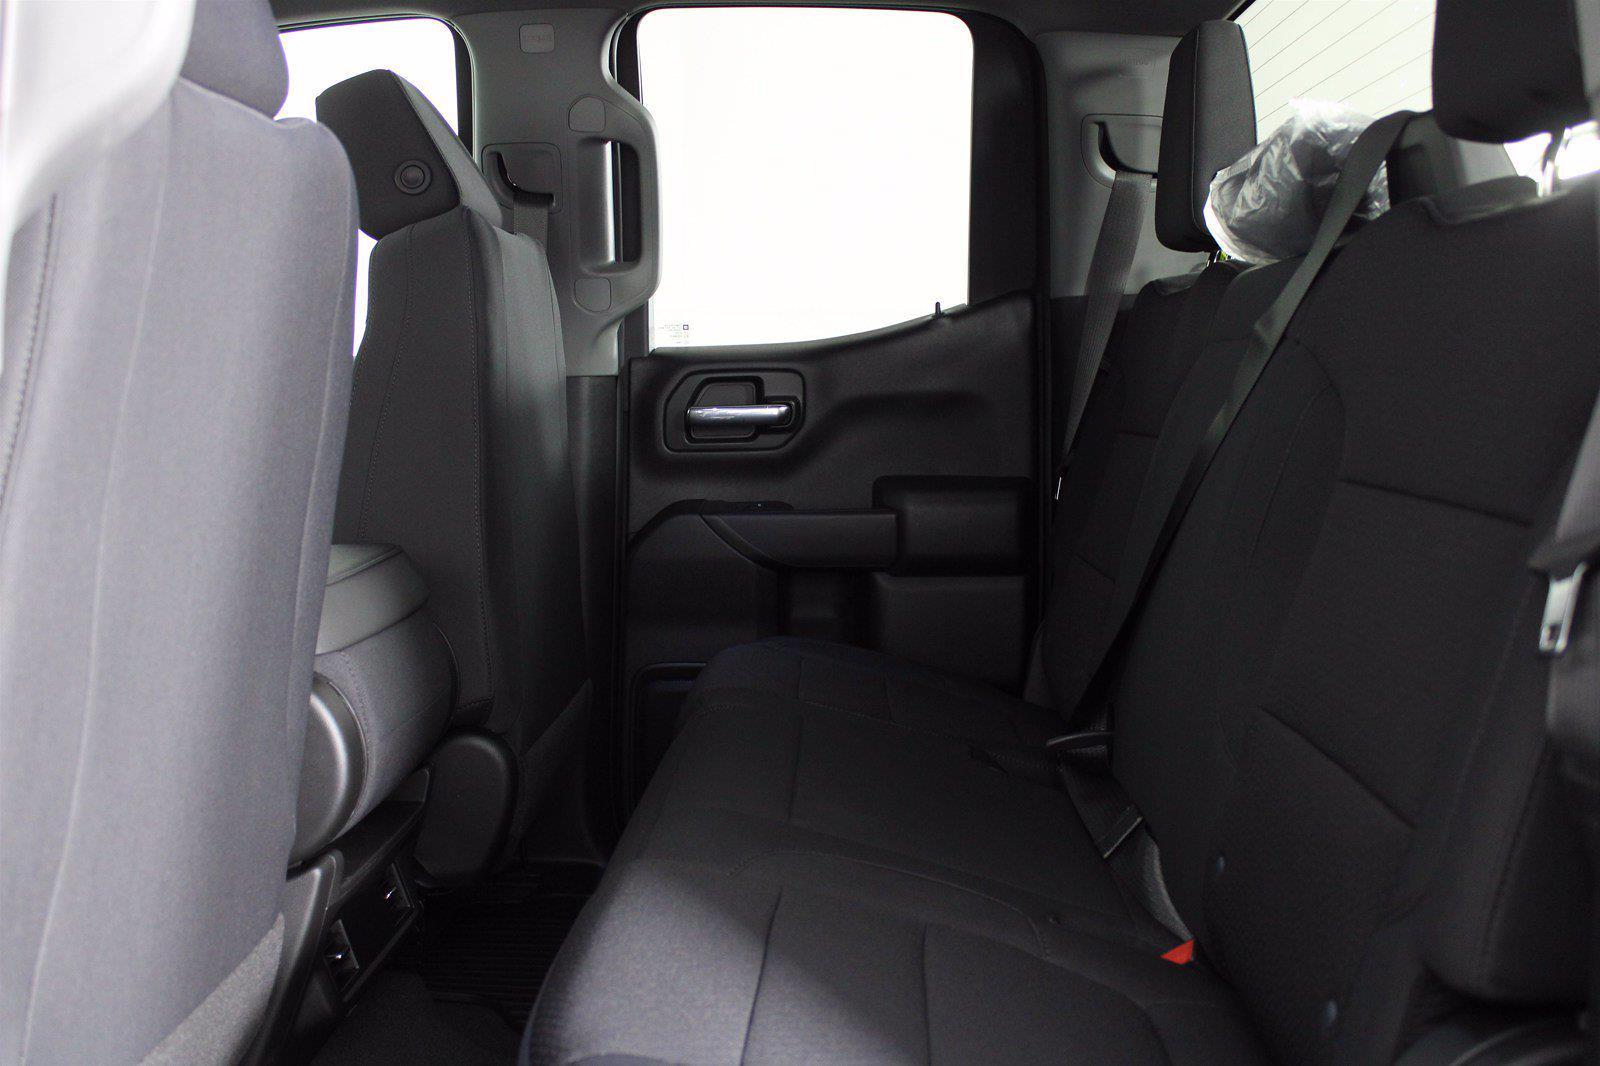 2021 Chevrolet Silverado 1500 Double Cab 4x4, Pickup #D111002 - photo 15